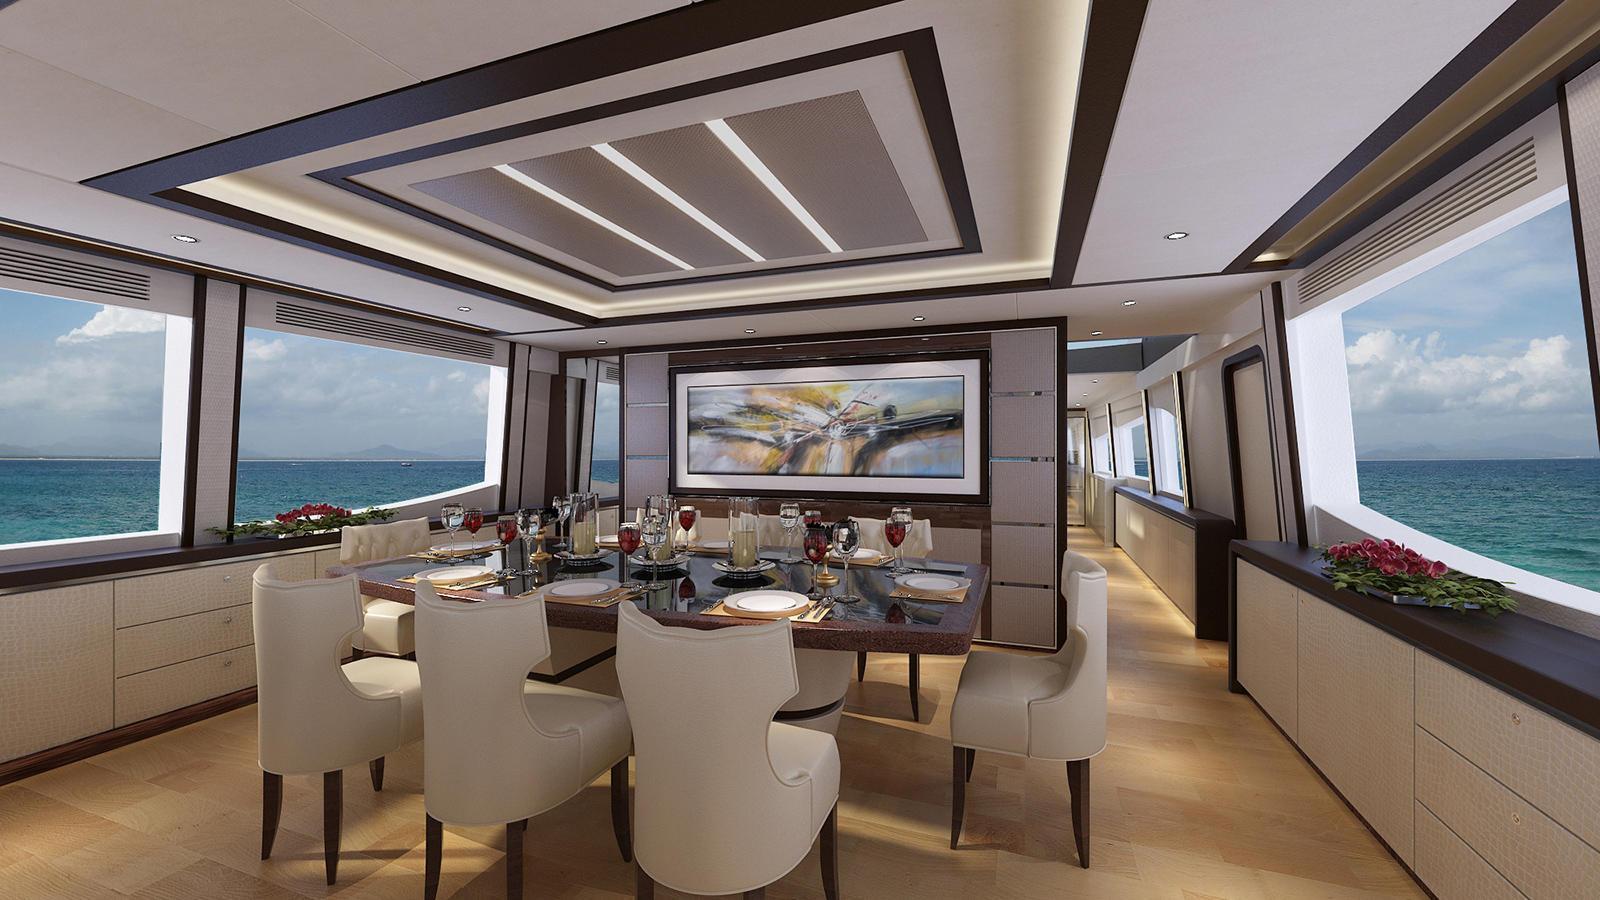 Asteria 108 motoryacht HeySea Yachts 33m 2019 dining area sistership